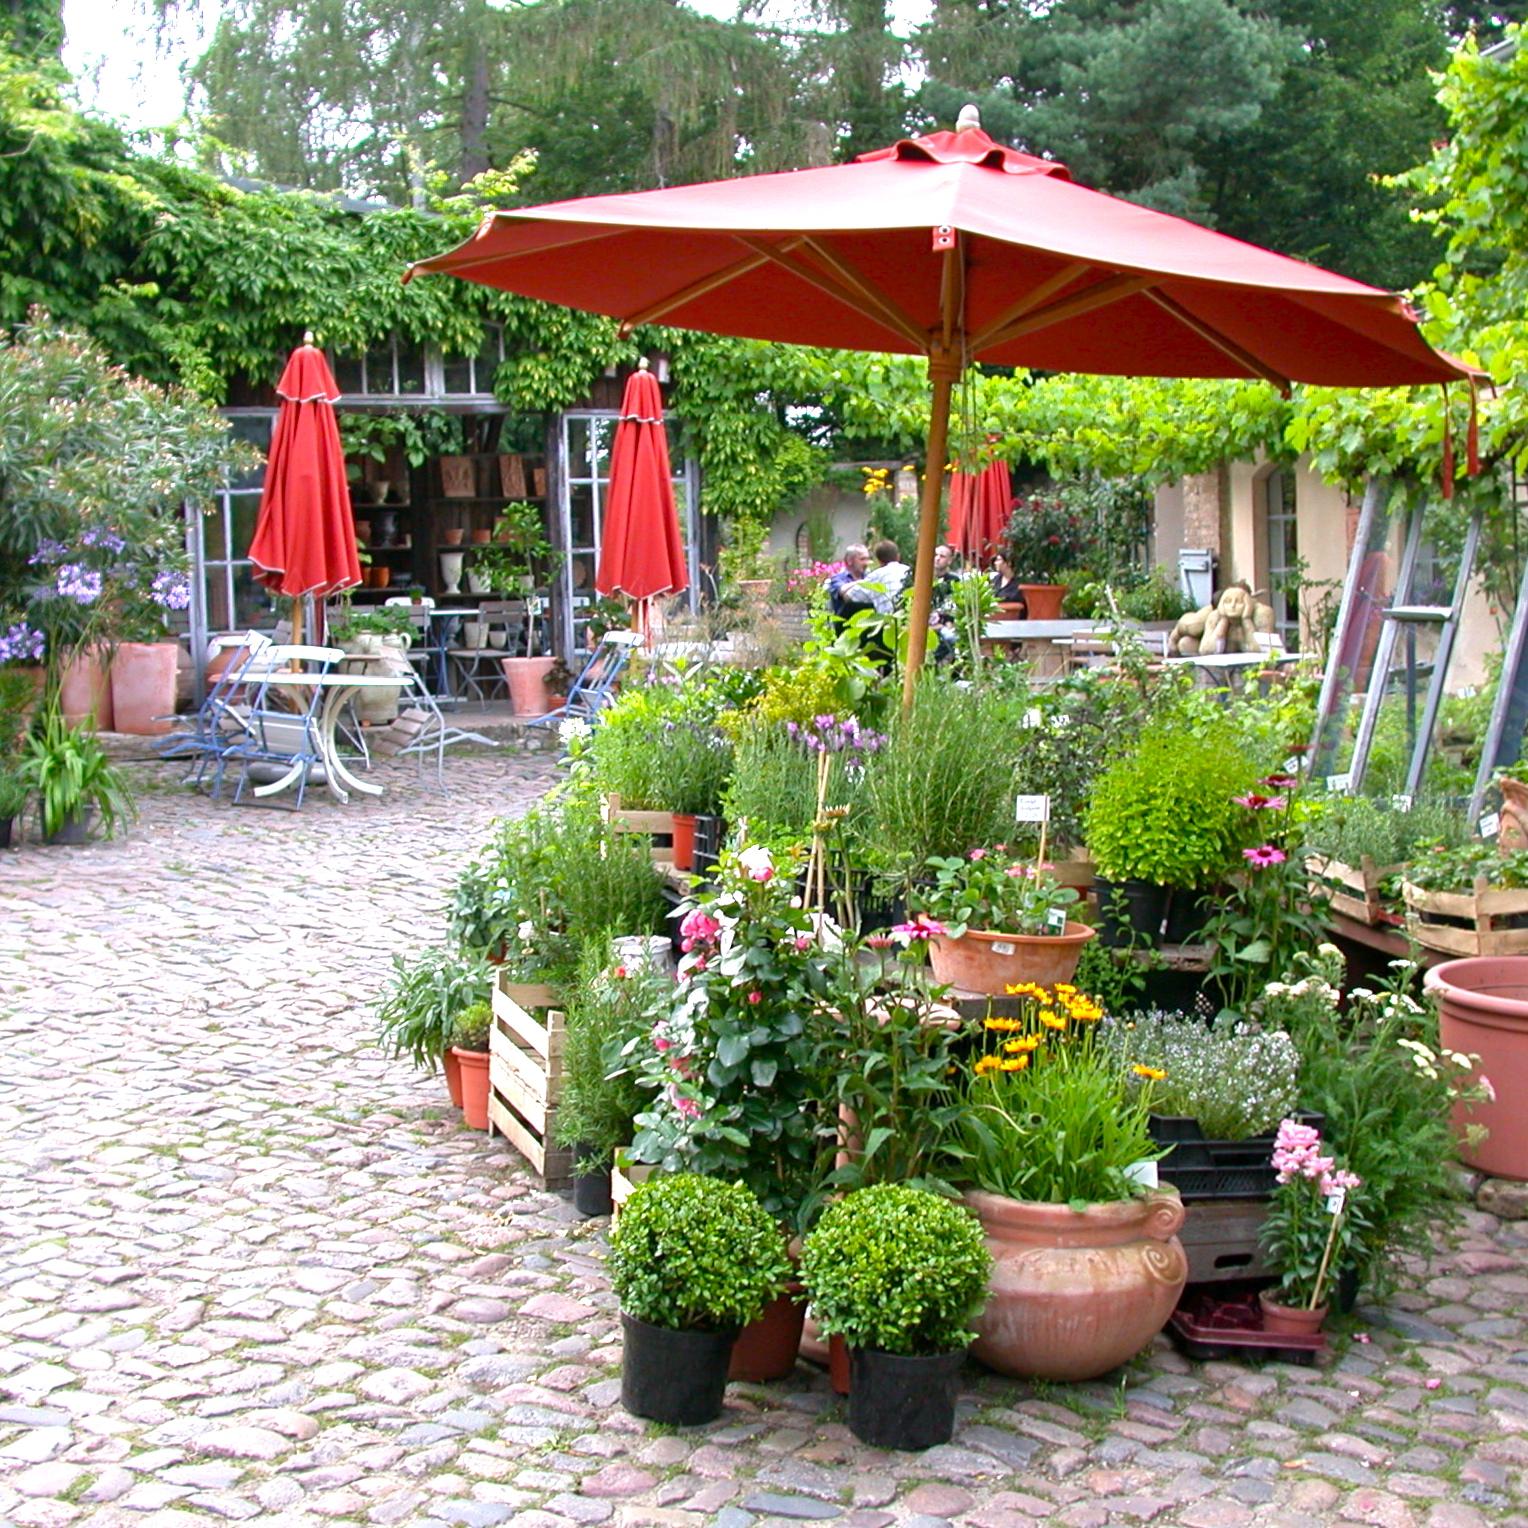 Hofcafe-Mutter-Fourage-Berlin-Wannsee-Hof